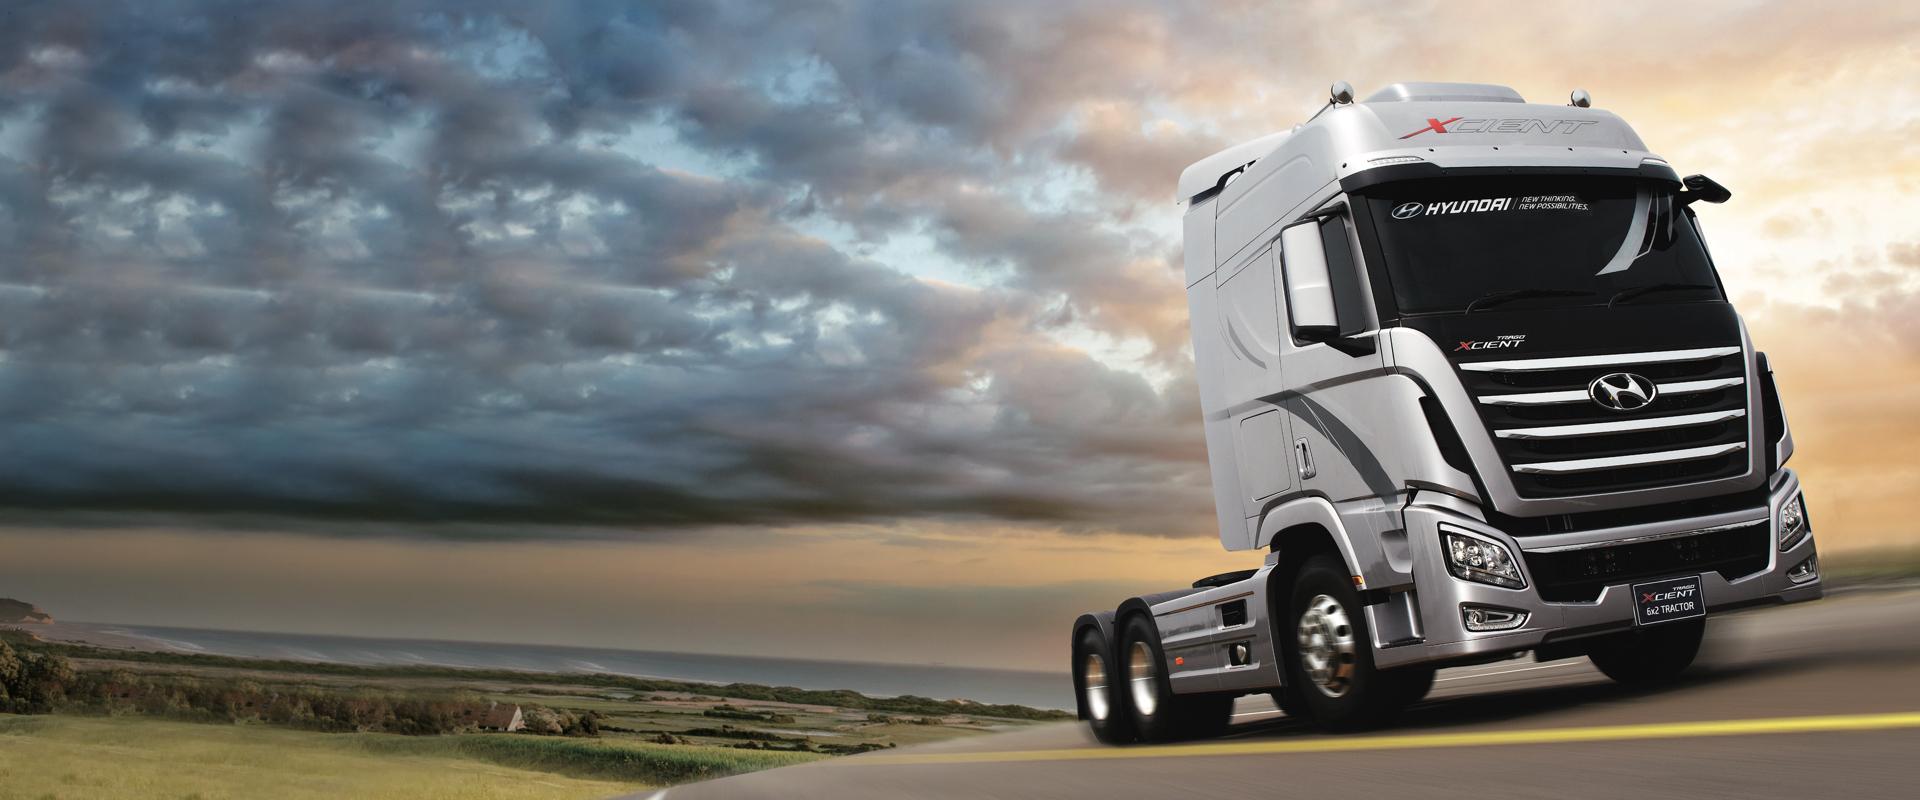 Hyundai Customer Service >> Design | Hyundai Truck & Bus